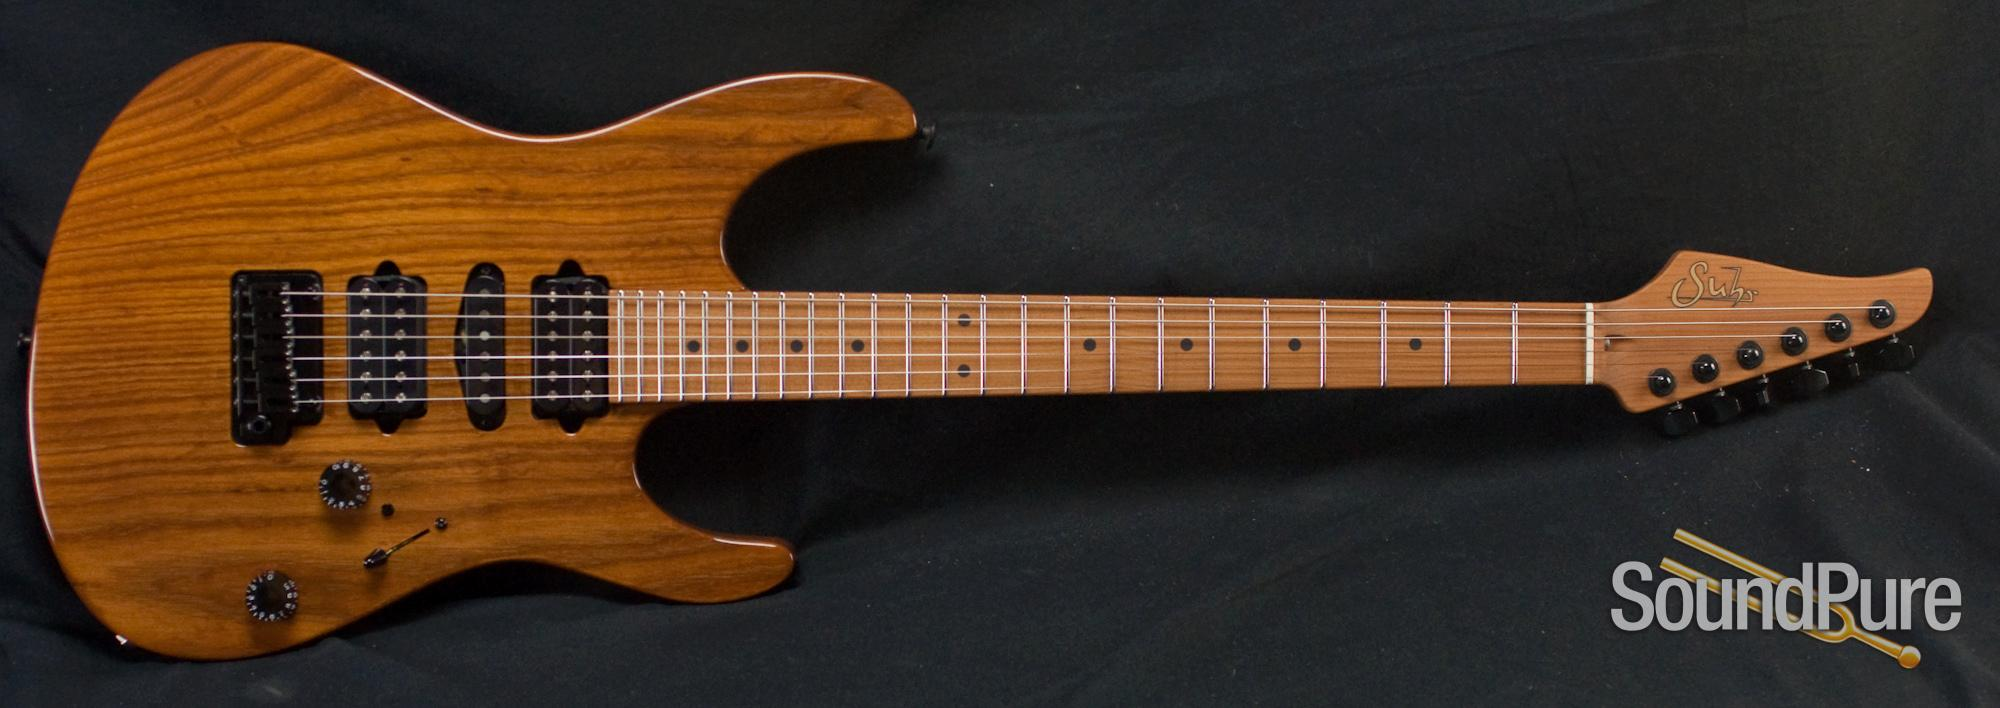 Suhr Modern Reverse Headstock Roasted Swamp Ash Guitar 25120